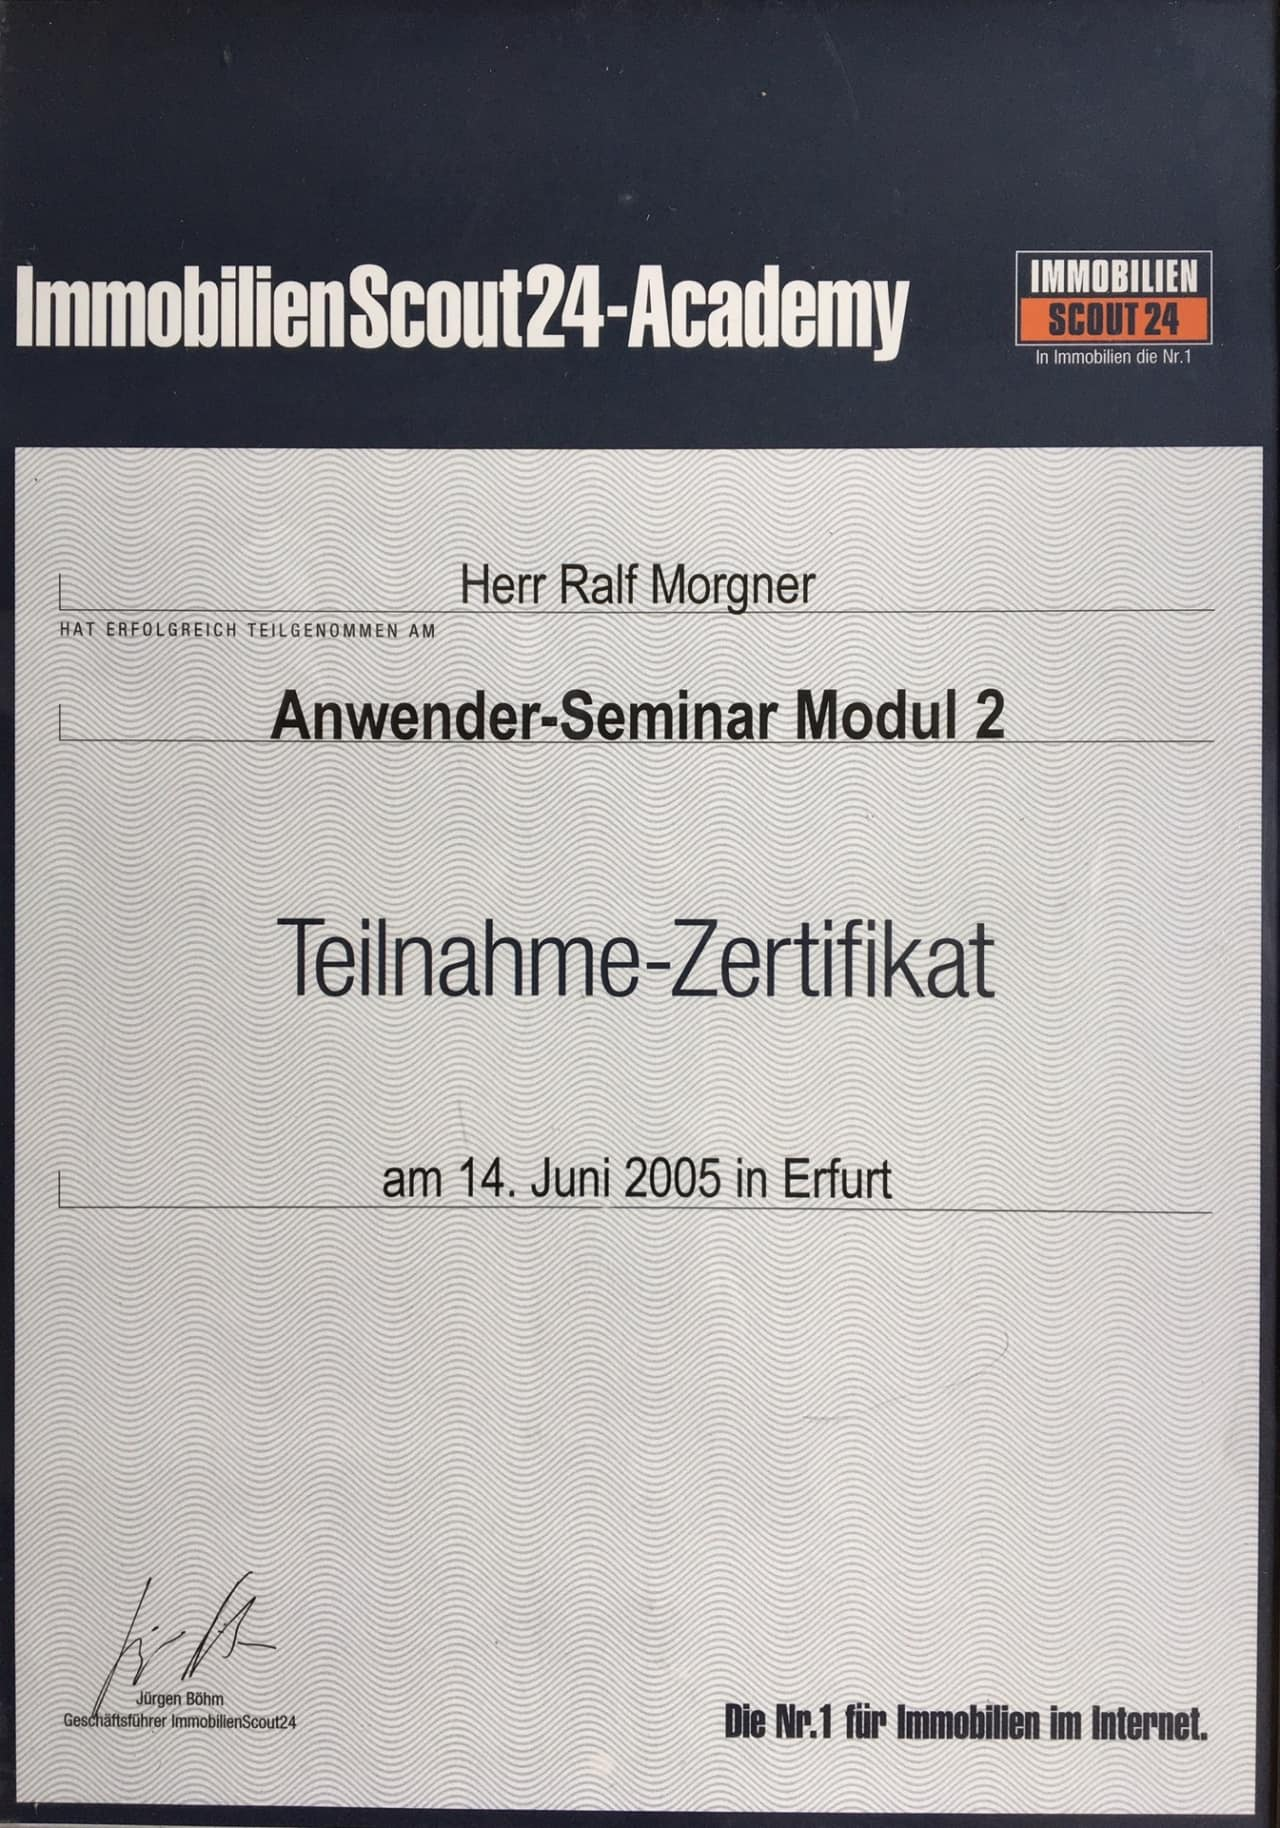 Immobilenscout24 Academy: Anwender-Seminar Modul 2